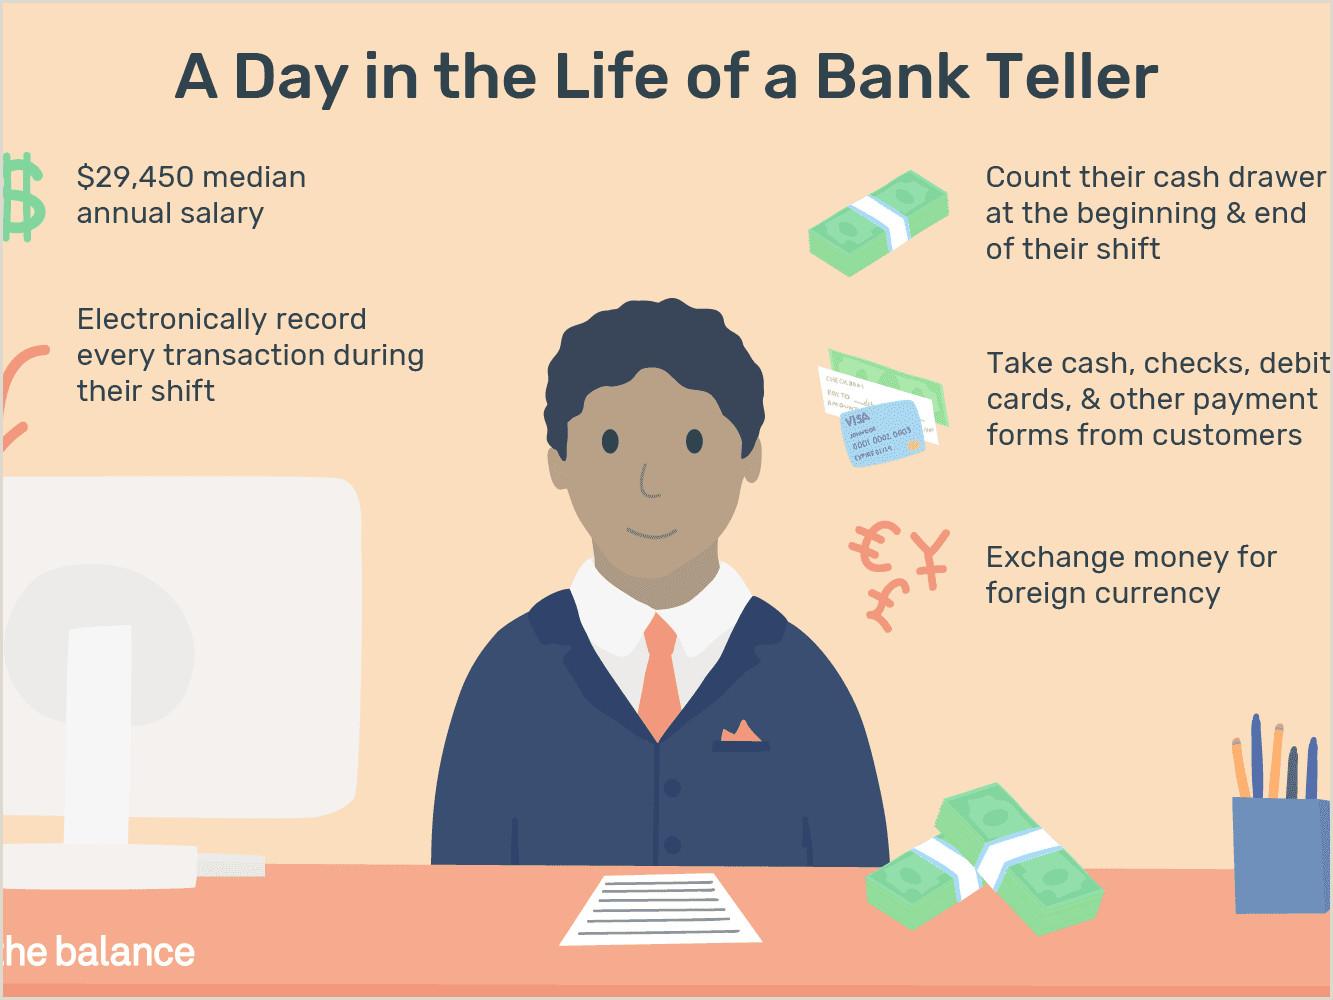 Bank Teller Job Description Salary Skills & More